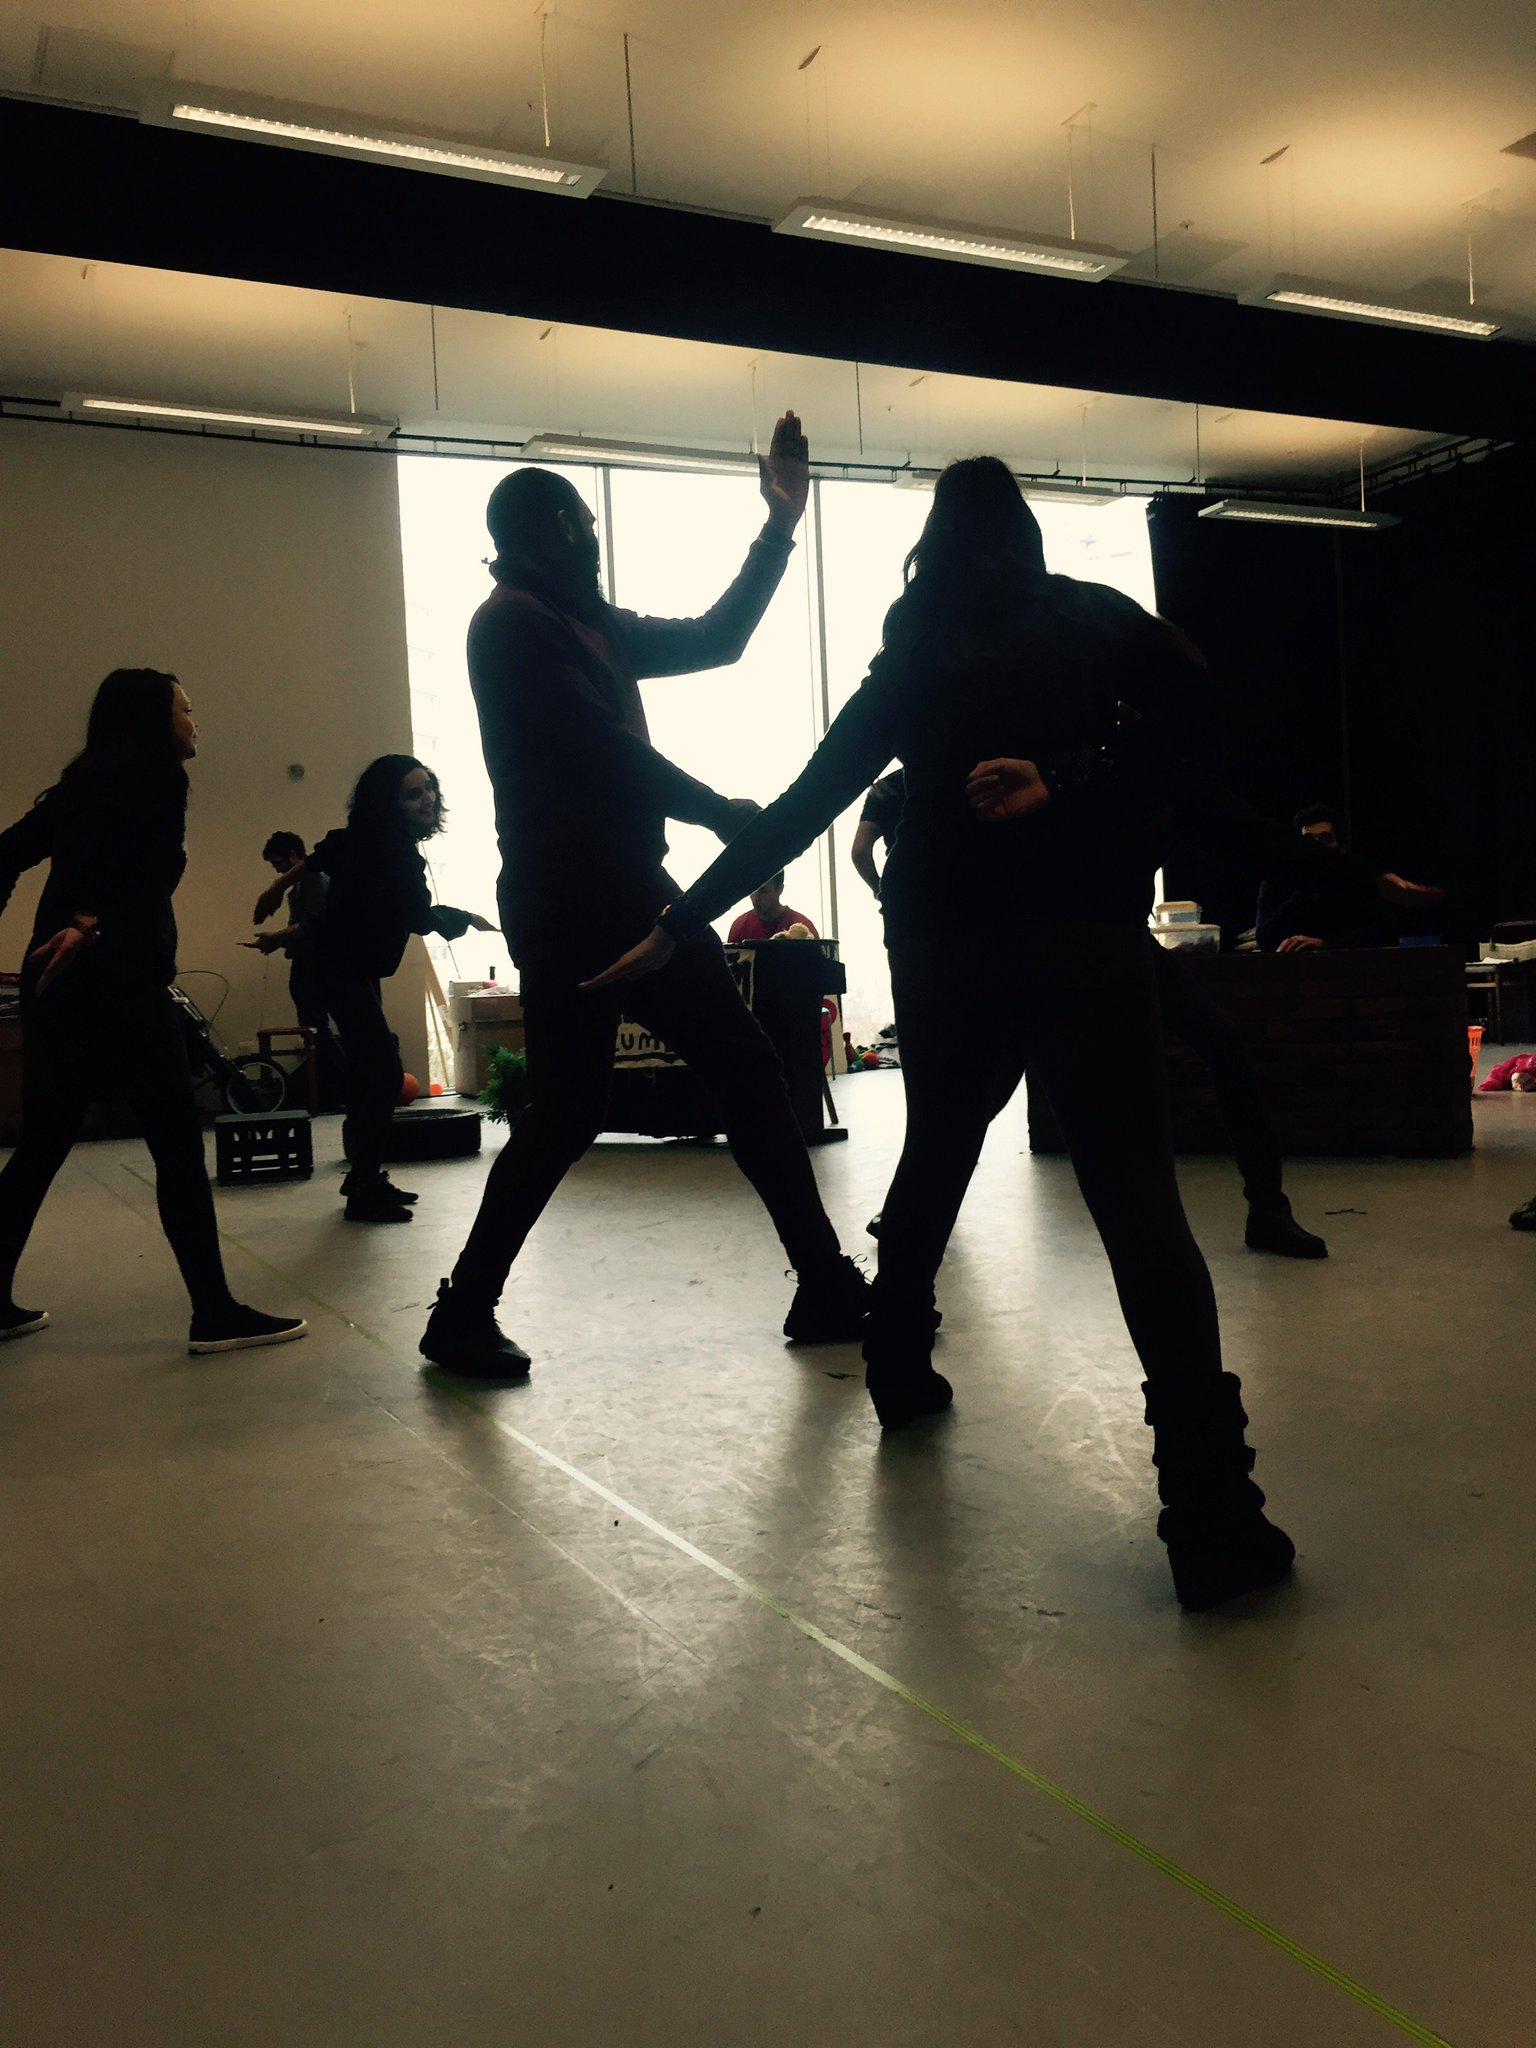 Ninja training 👊 #AnitaAndMe https://t.co/fCvGYyFYHP